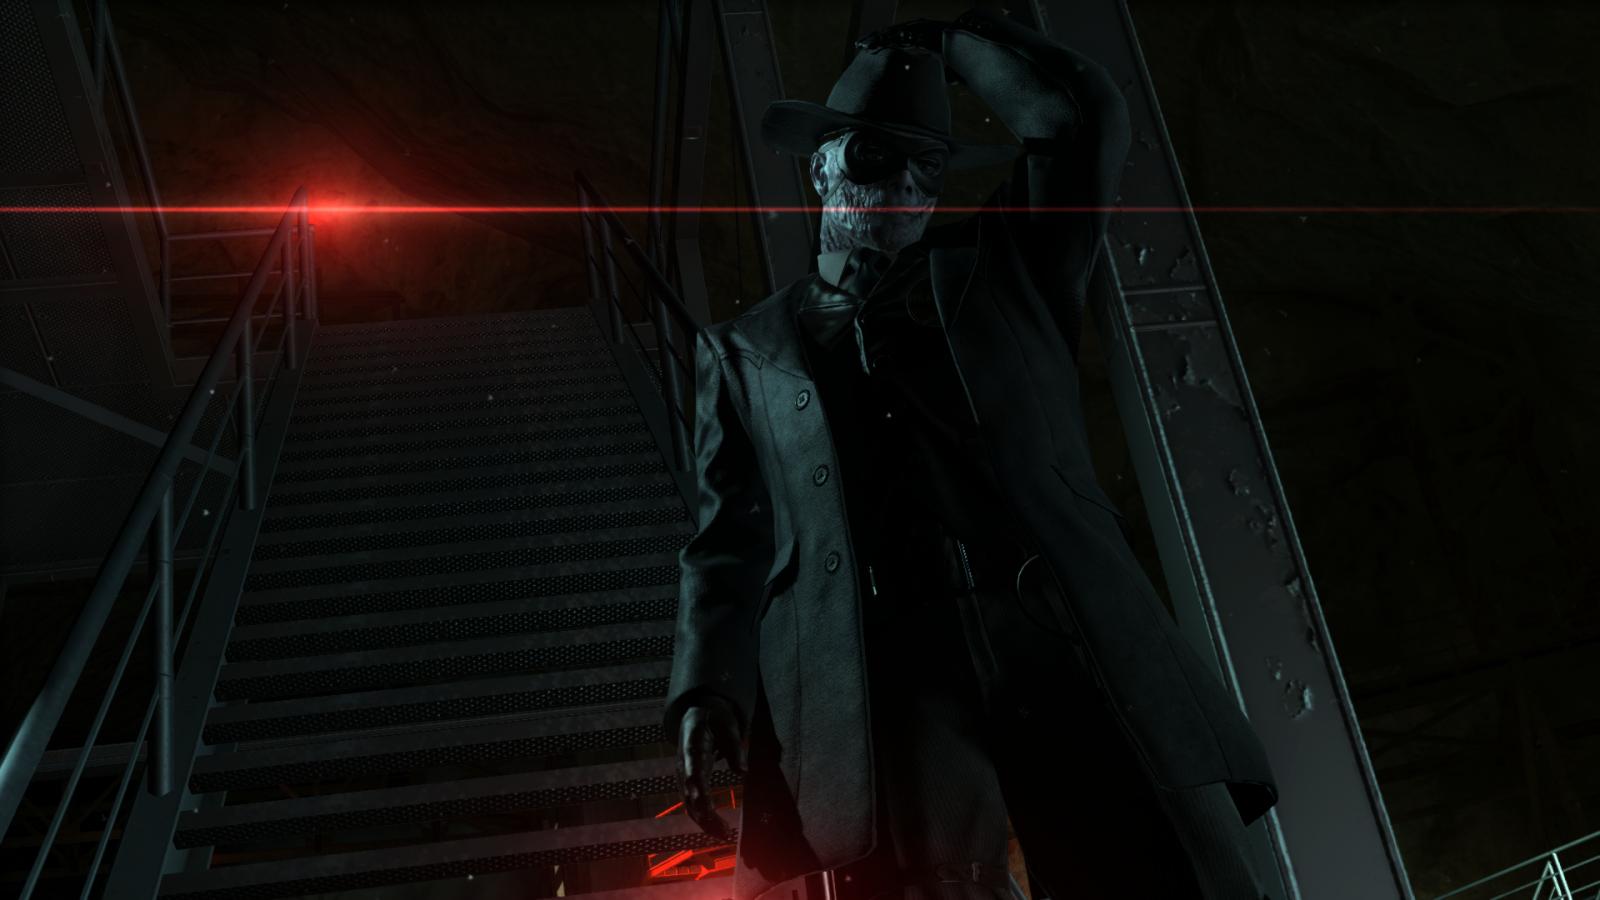 Wallpaper Video Games Night Metal Gear Solid Metal Gear Solid